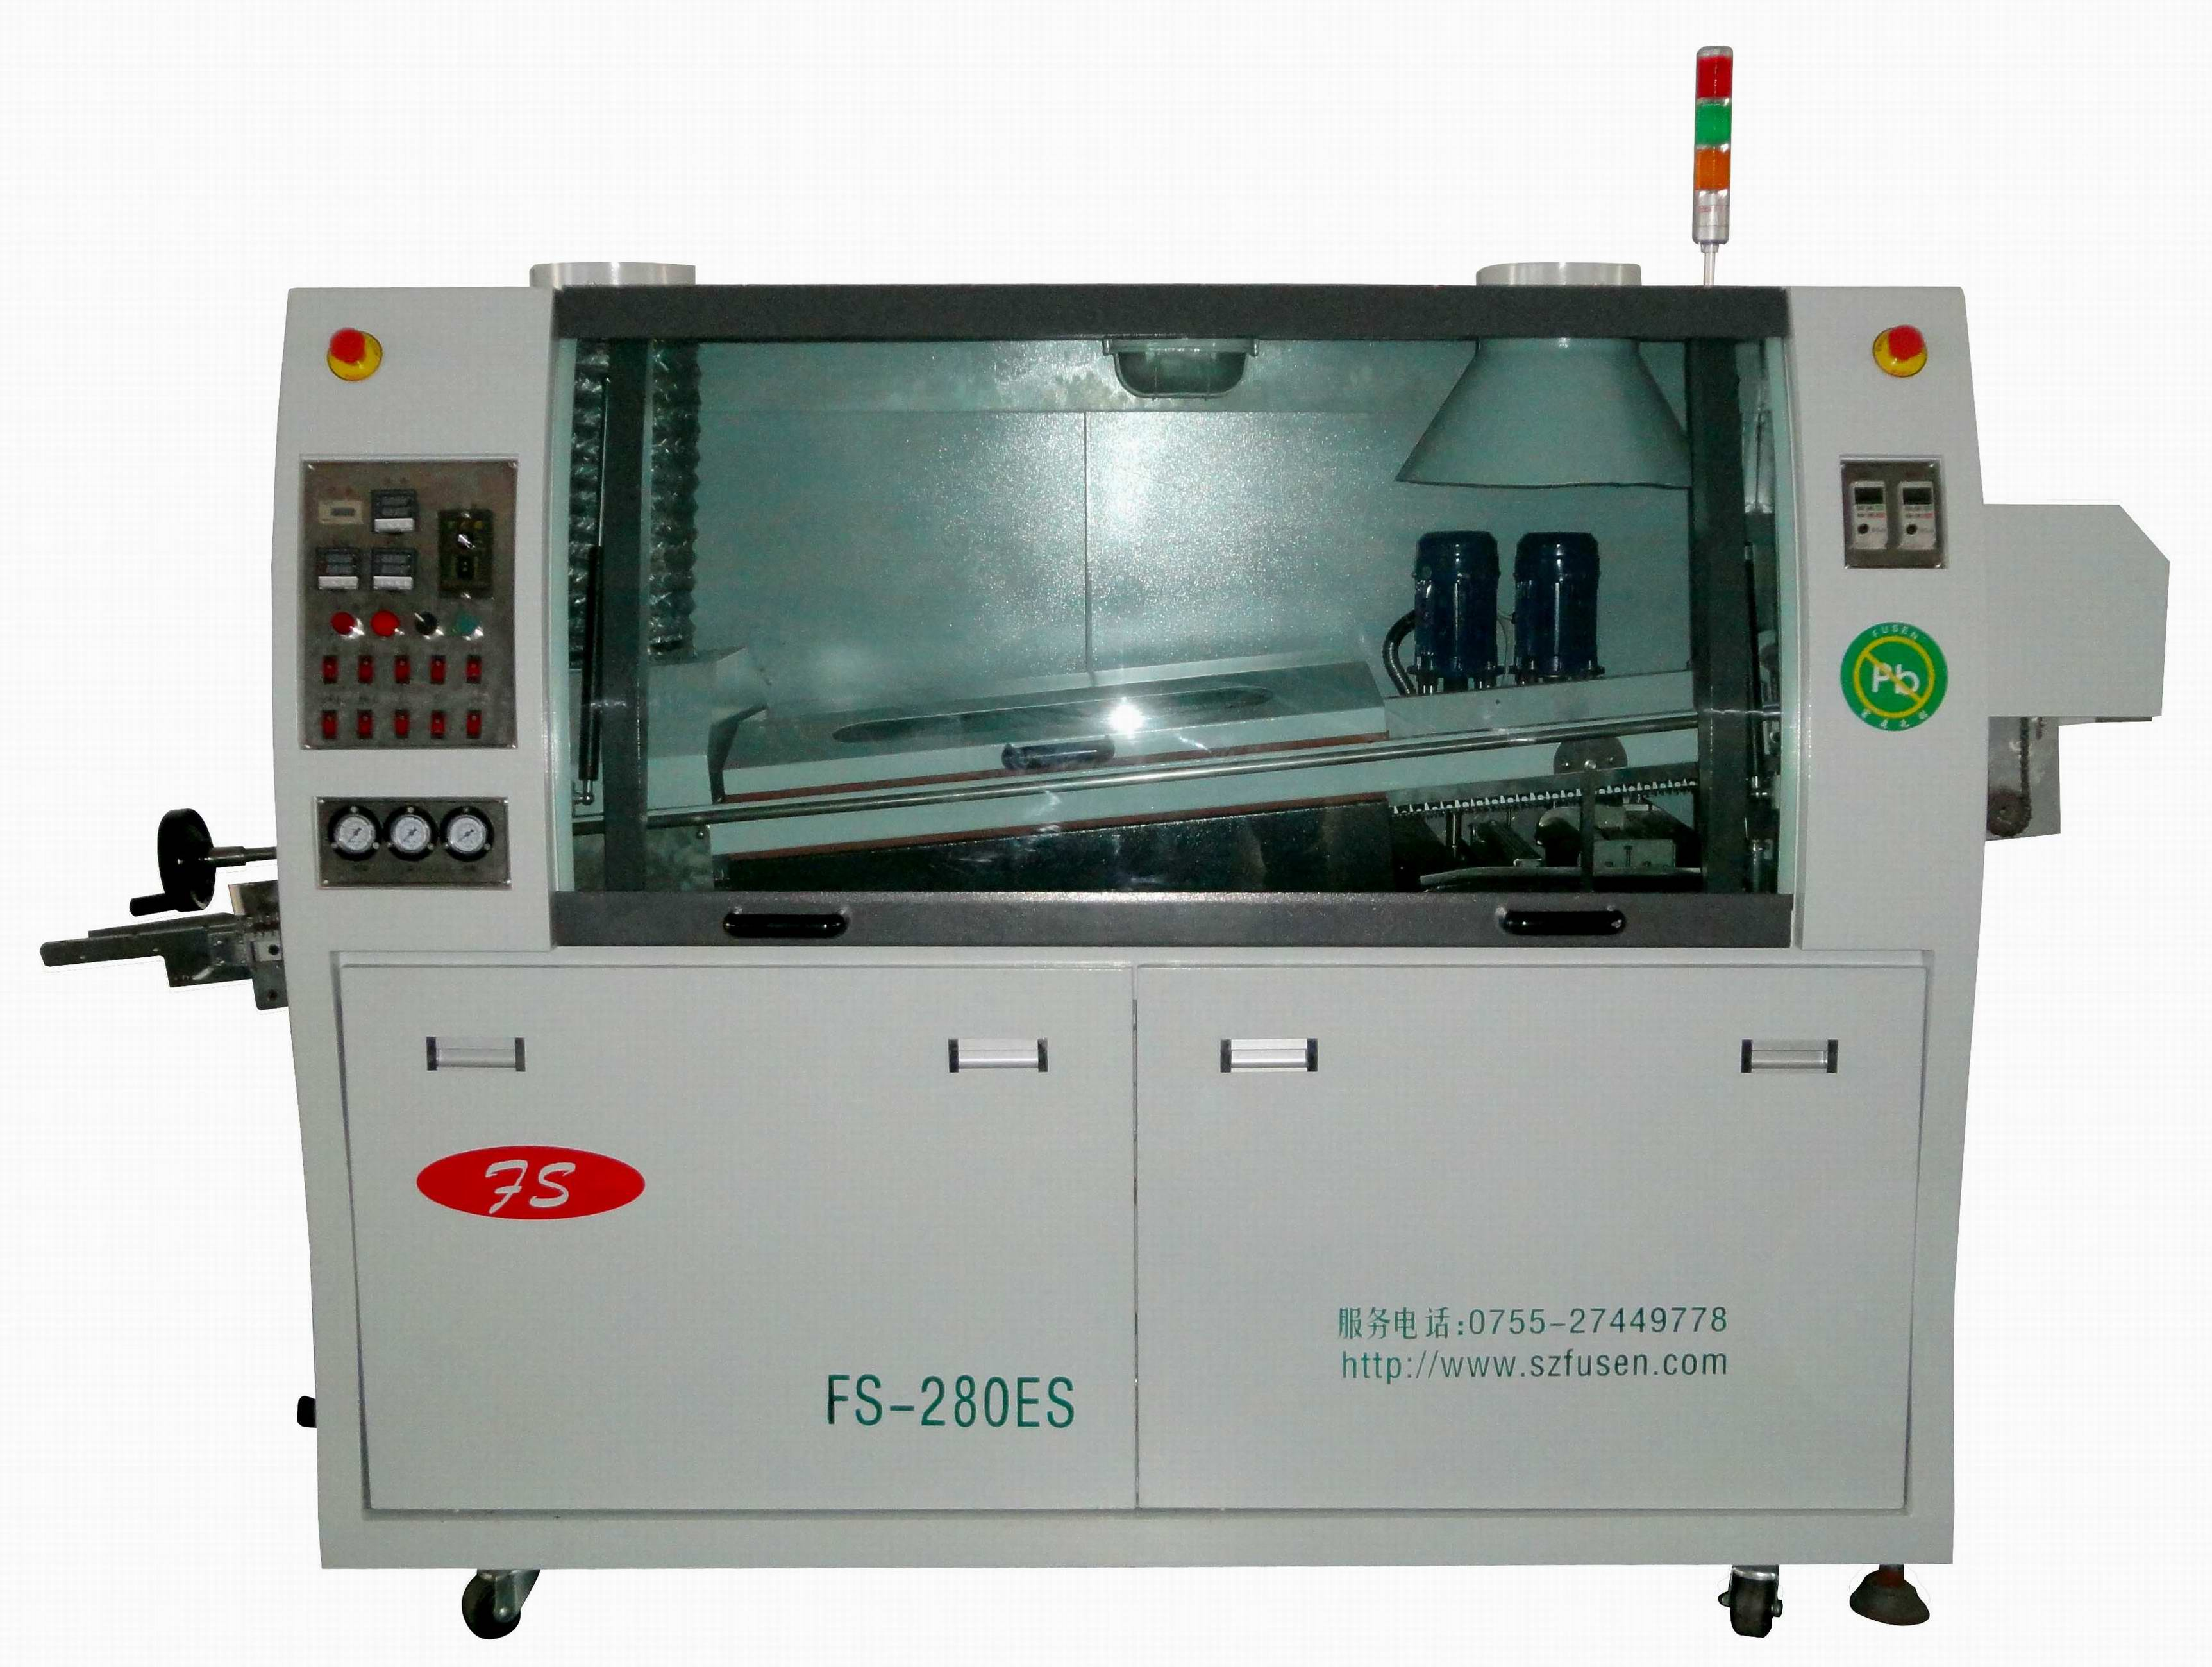 经济型波峰焊FS-280ES